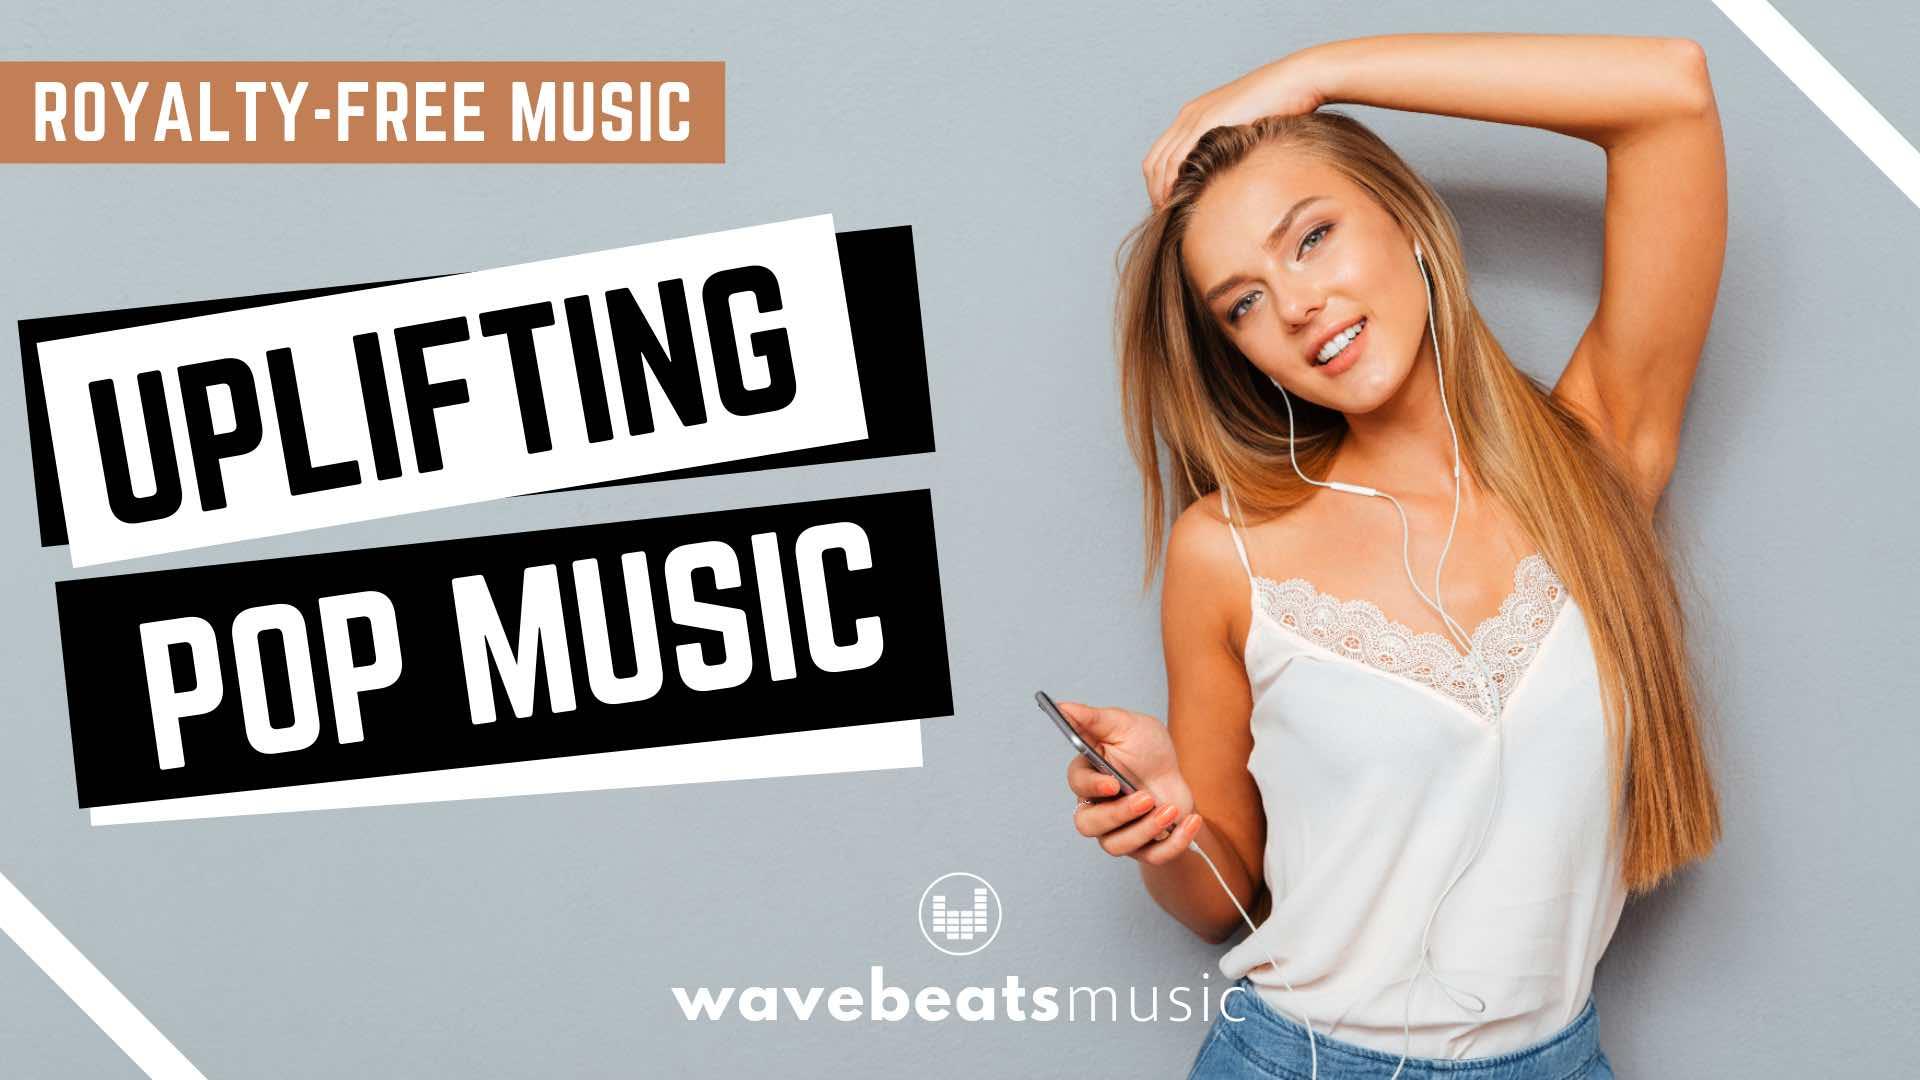 Energetic Upbeat & Uplifting Pop by WavebeatsMusic   AudioJungle